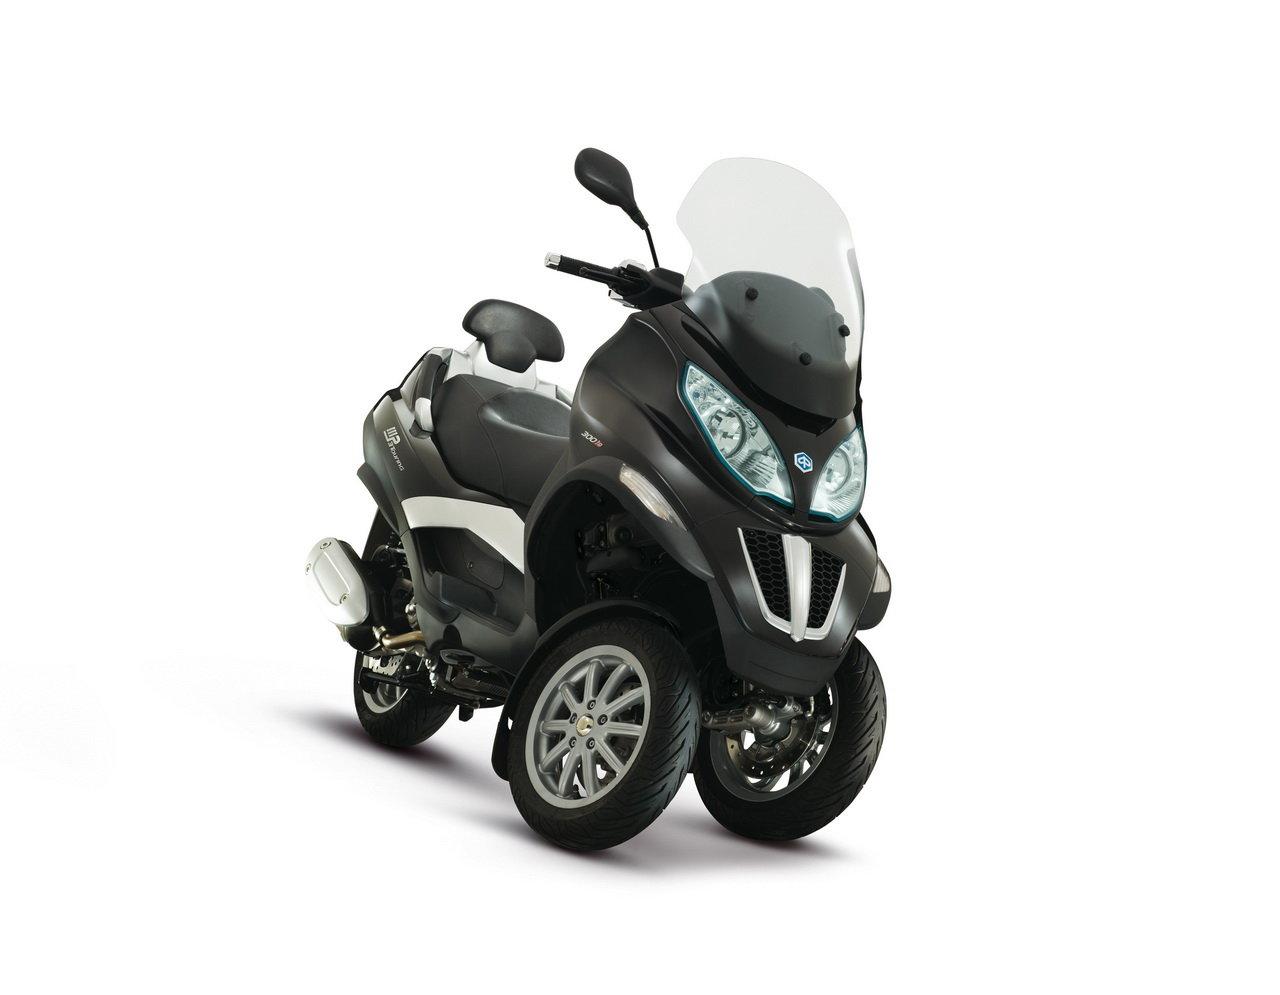 Listino Piaggio Fly 150 Scooter 150-300 - image 15101_piaggio-mp3300-ie-touring on https://moto.motori.net